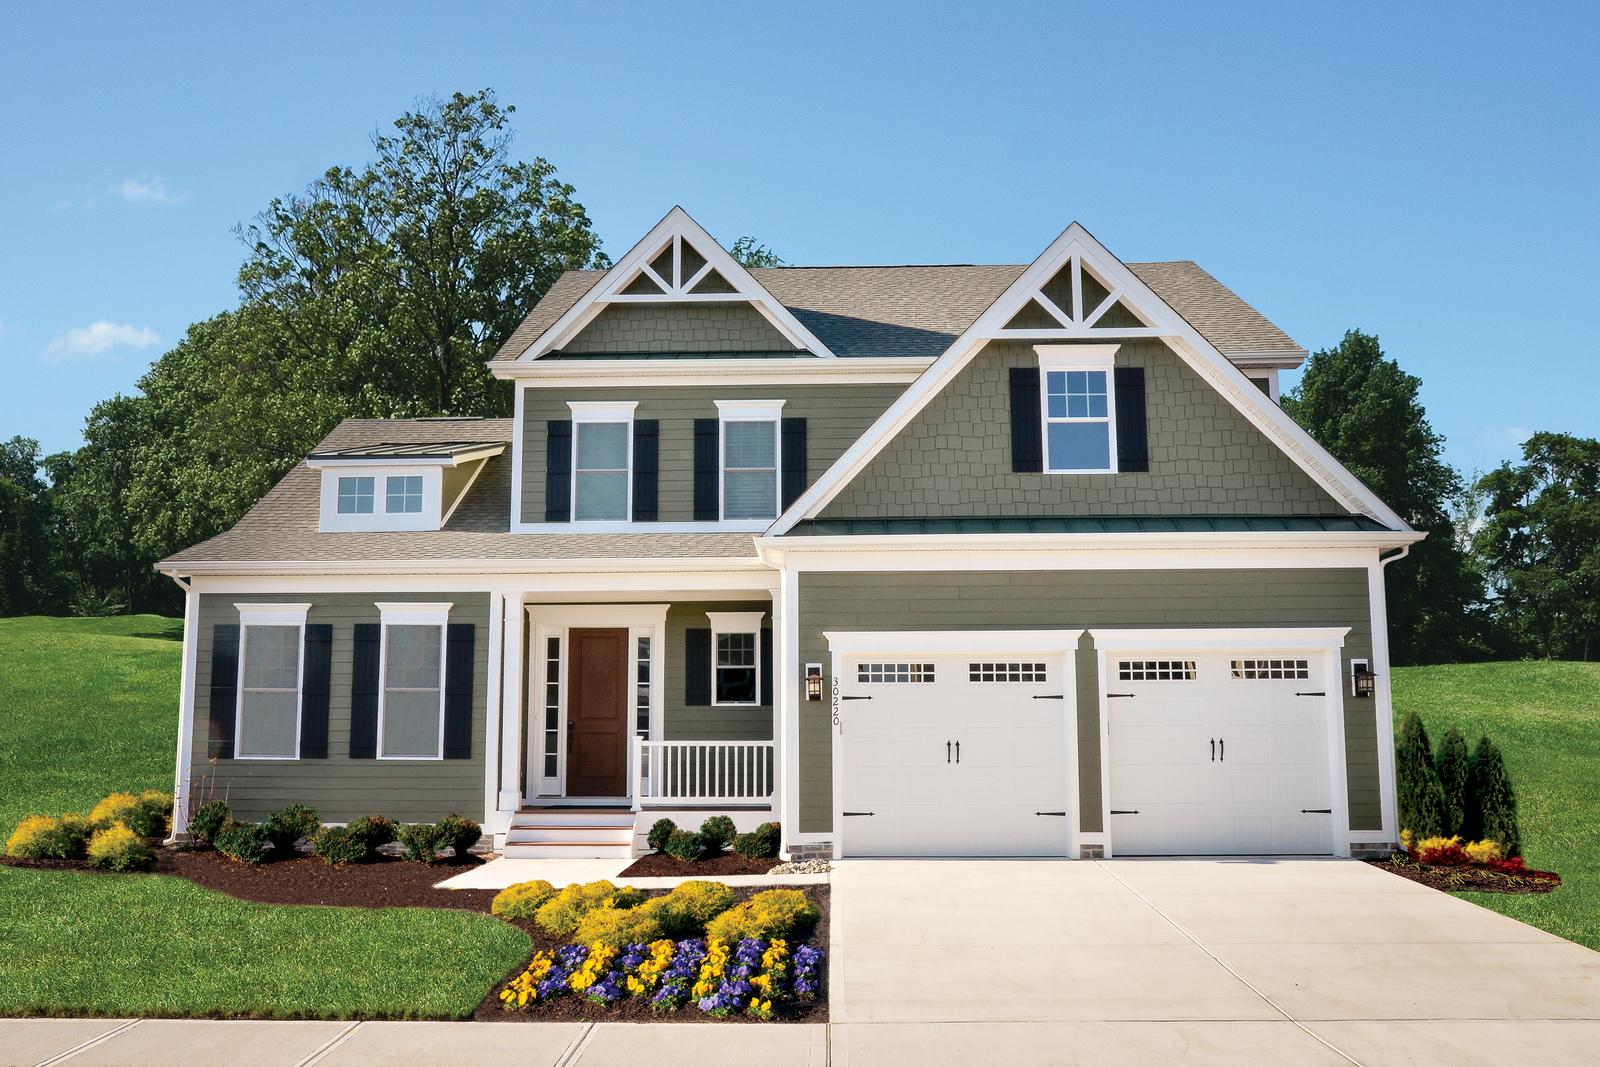 New Cavanaugh Home Model For Sale Heartland Homes